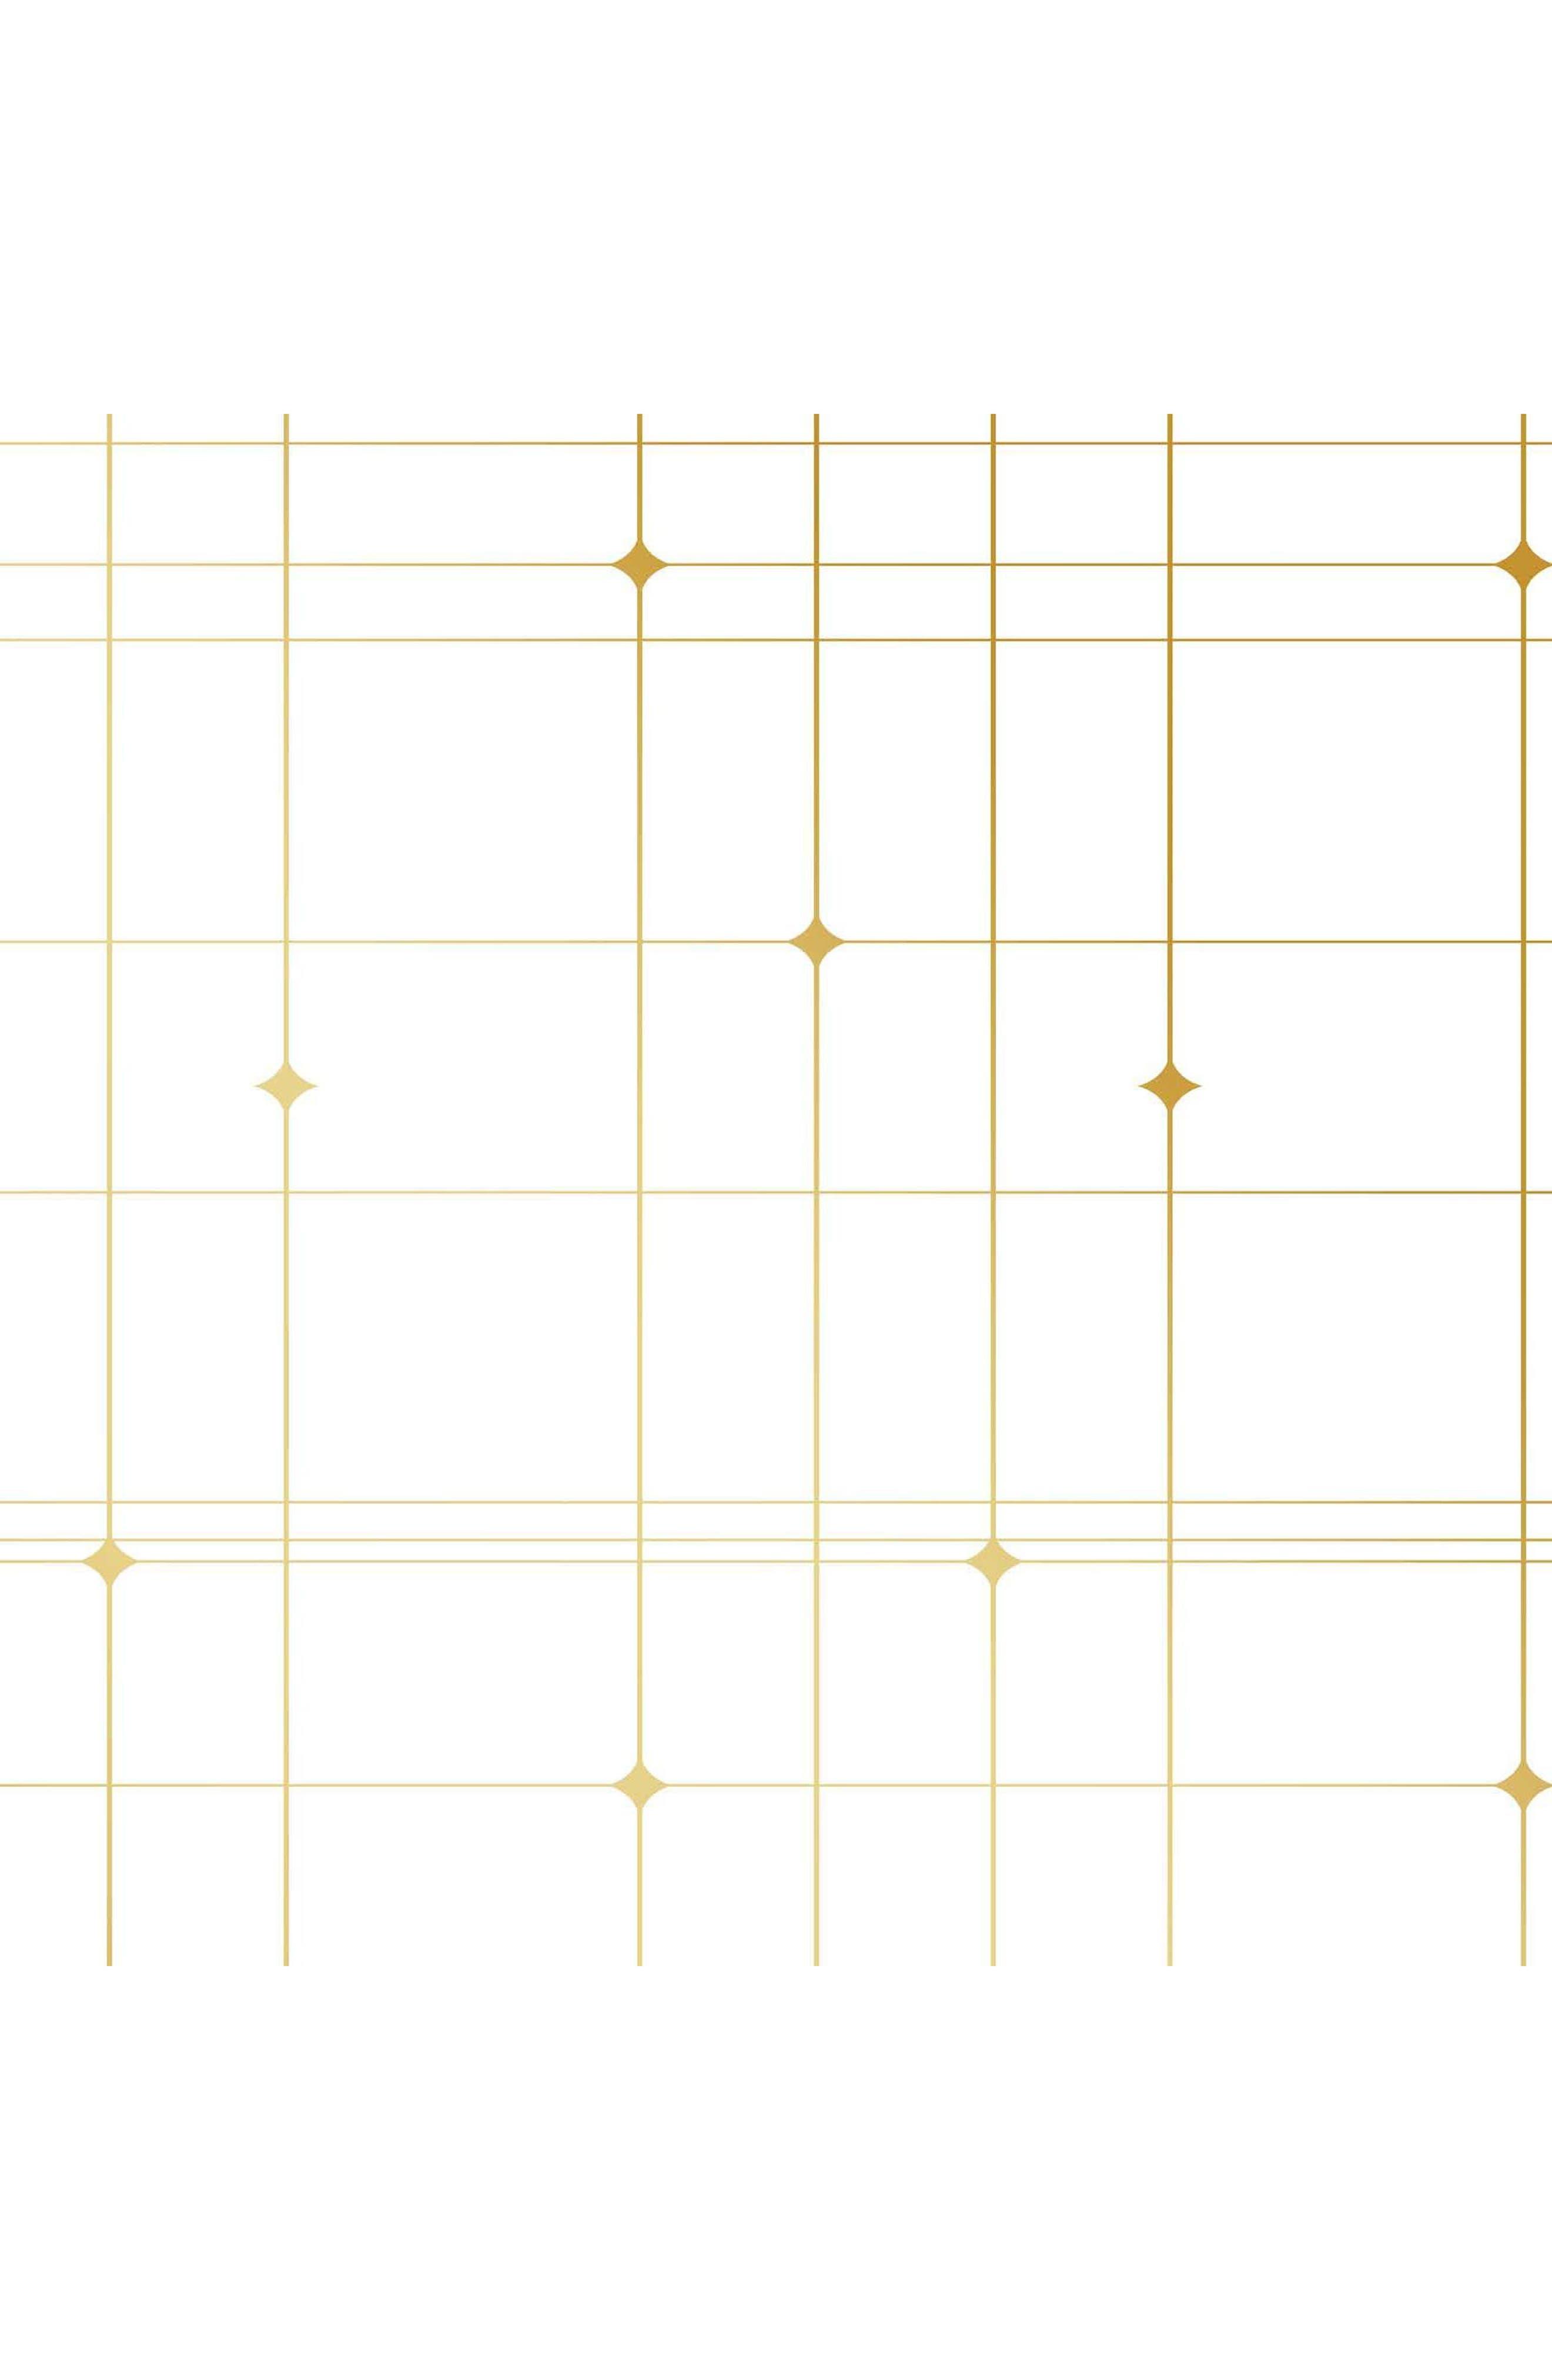 Thermoscad Self-Adhesive Vinyl Wallpaper,                             Main thumbnail 1, color,                             Metallic Gold/ White